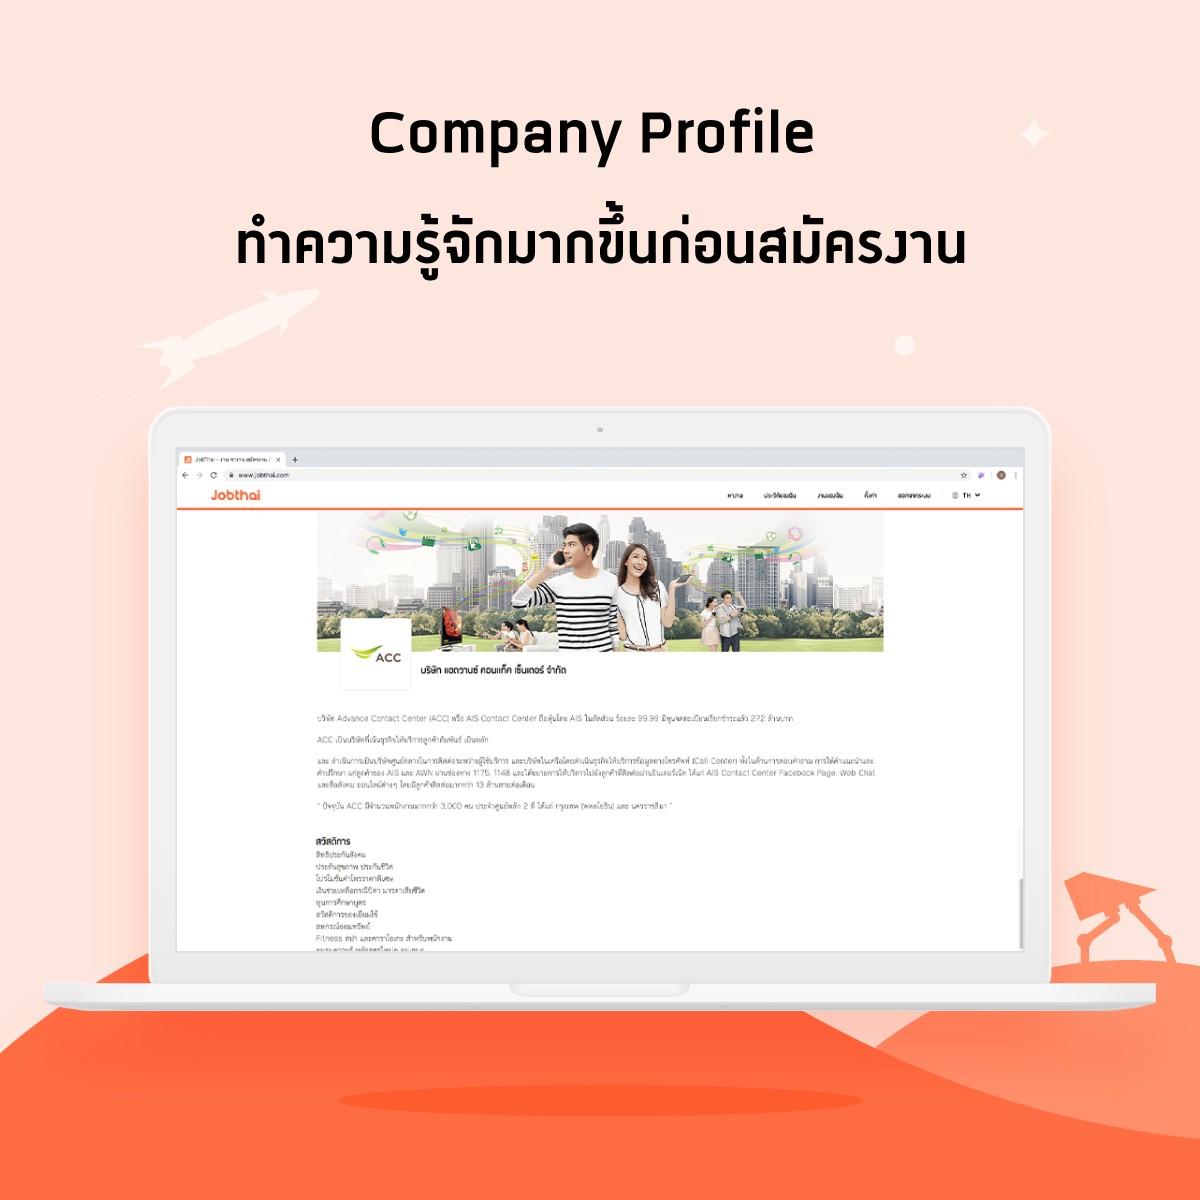 JobThai เว็บไซต์ดีไซน์ใหม่ Company Profile งาน หางาน สมัครงาน